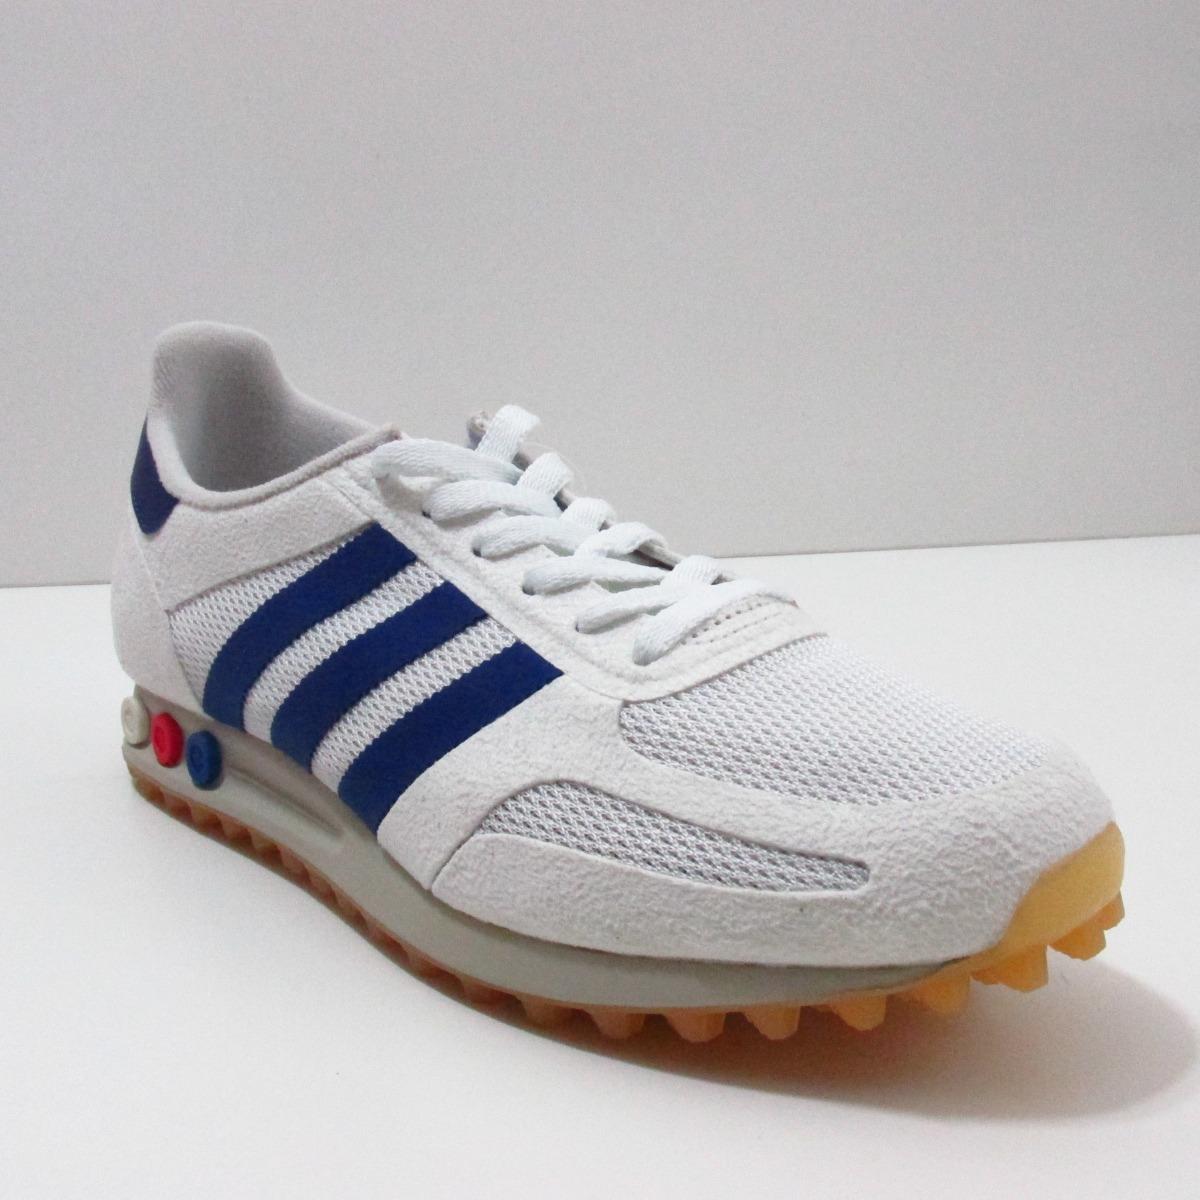 Carregando zoom... 2 tênis masculino adidas originals la trainer produto  europeu 53c14b7f54fe0